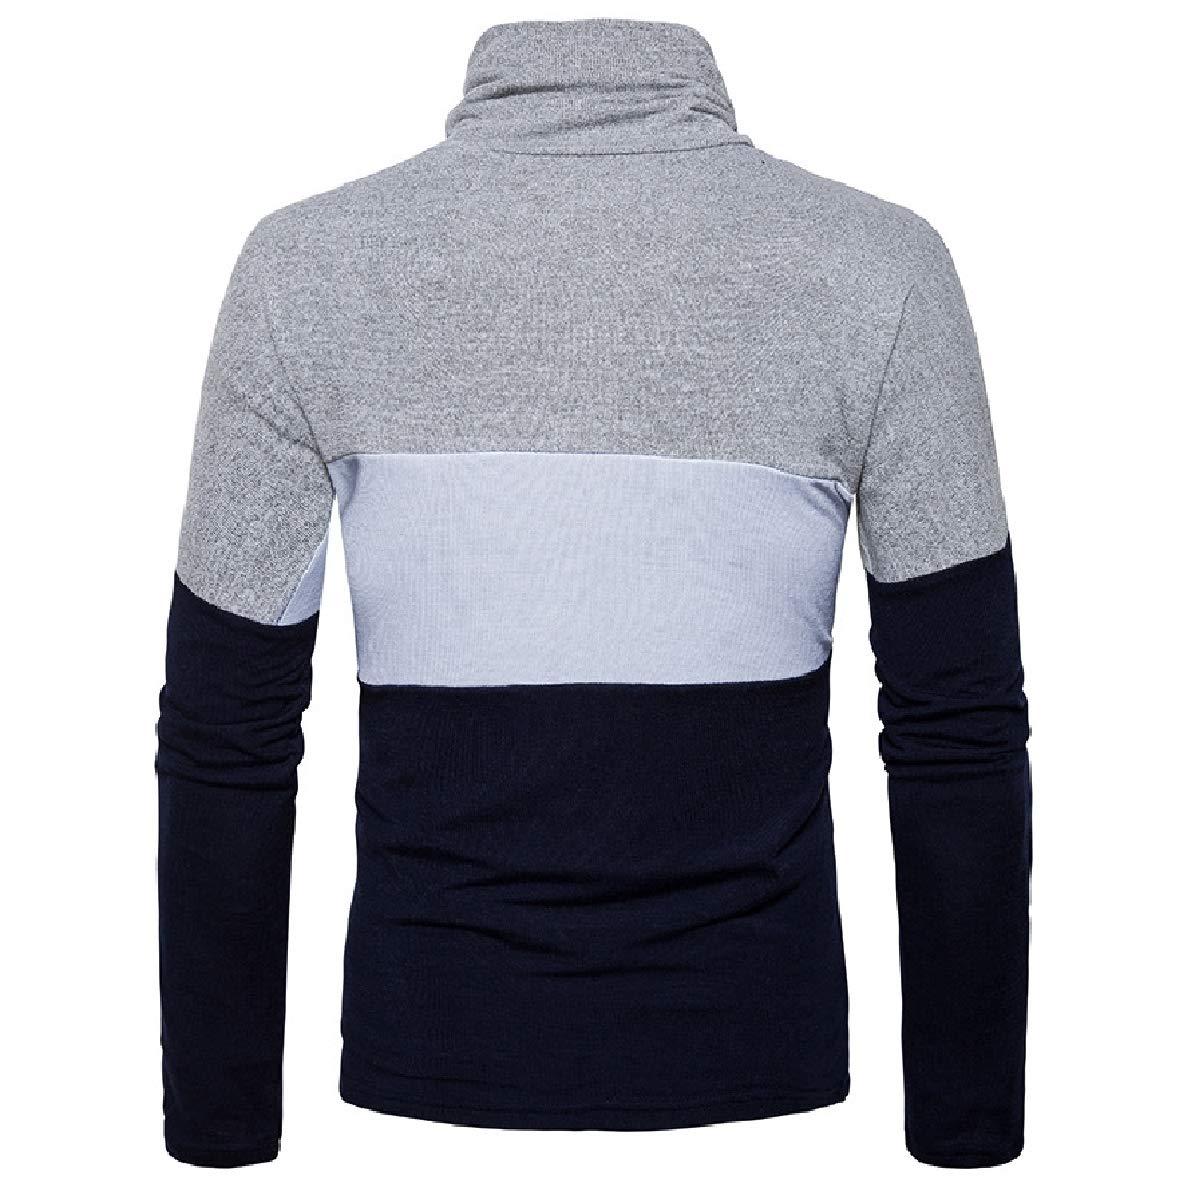 Winwinus Mens Bodycon Turtleneck Plus Size Business Top Tee Sweater